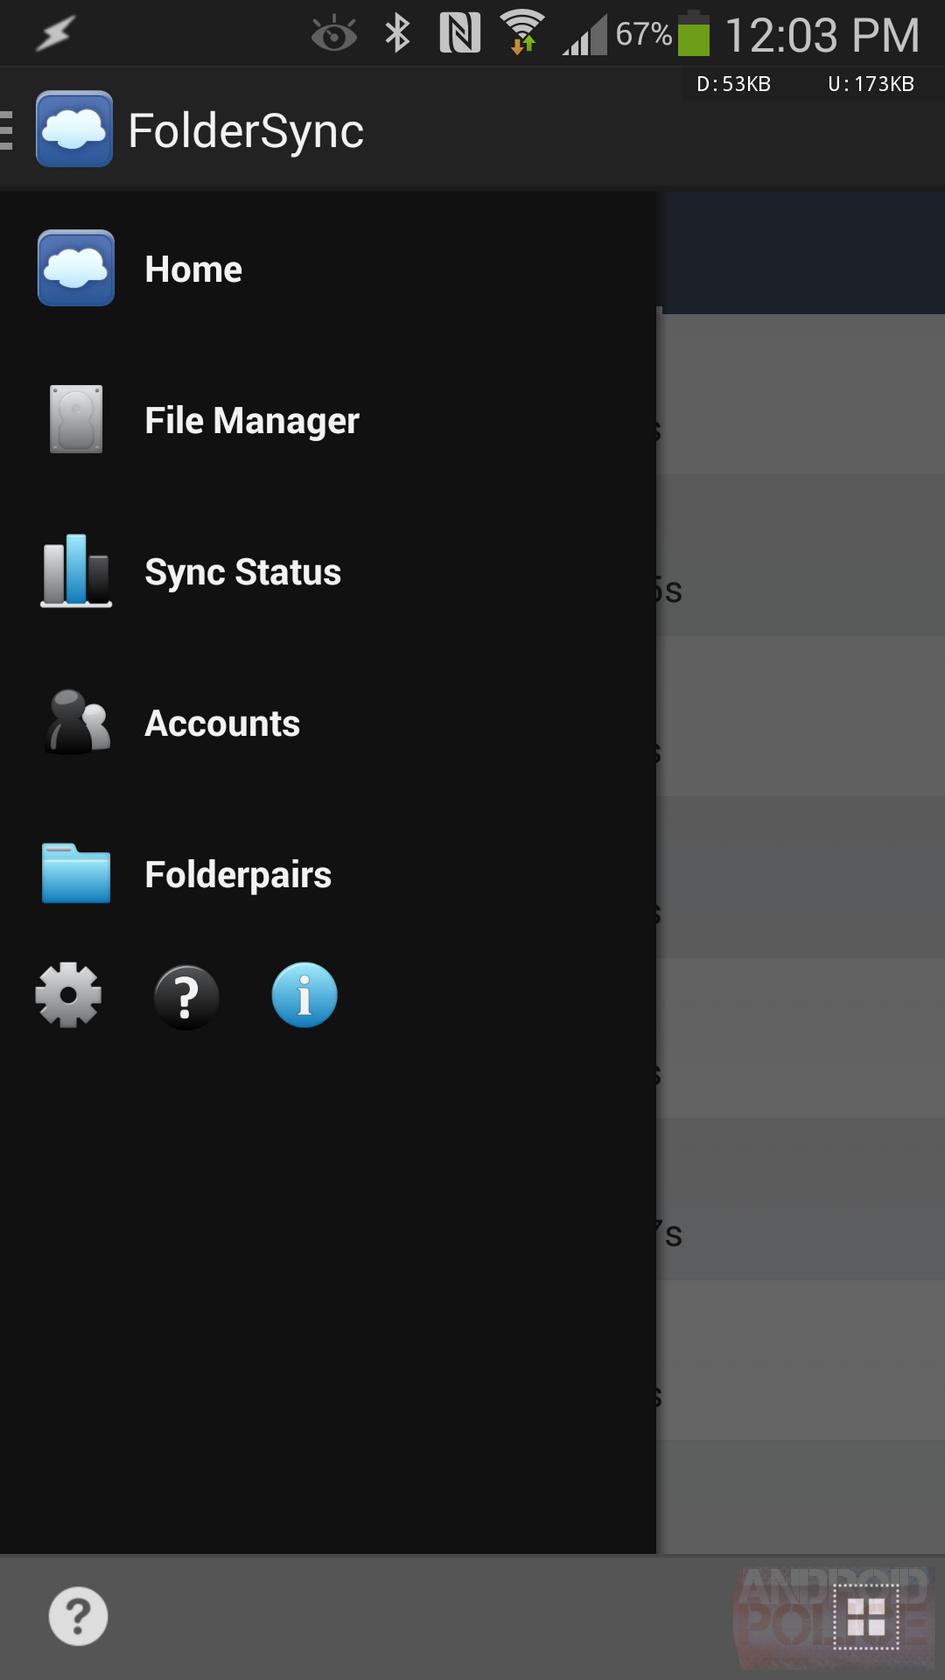 FolderSync Updated To v2.5 With Hamburger Navigation, New